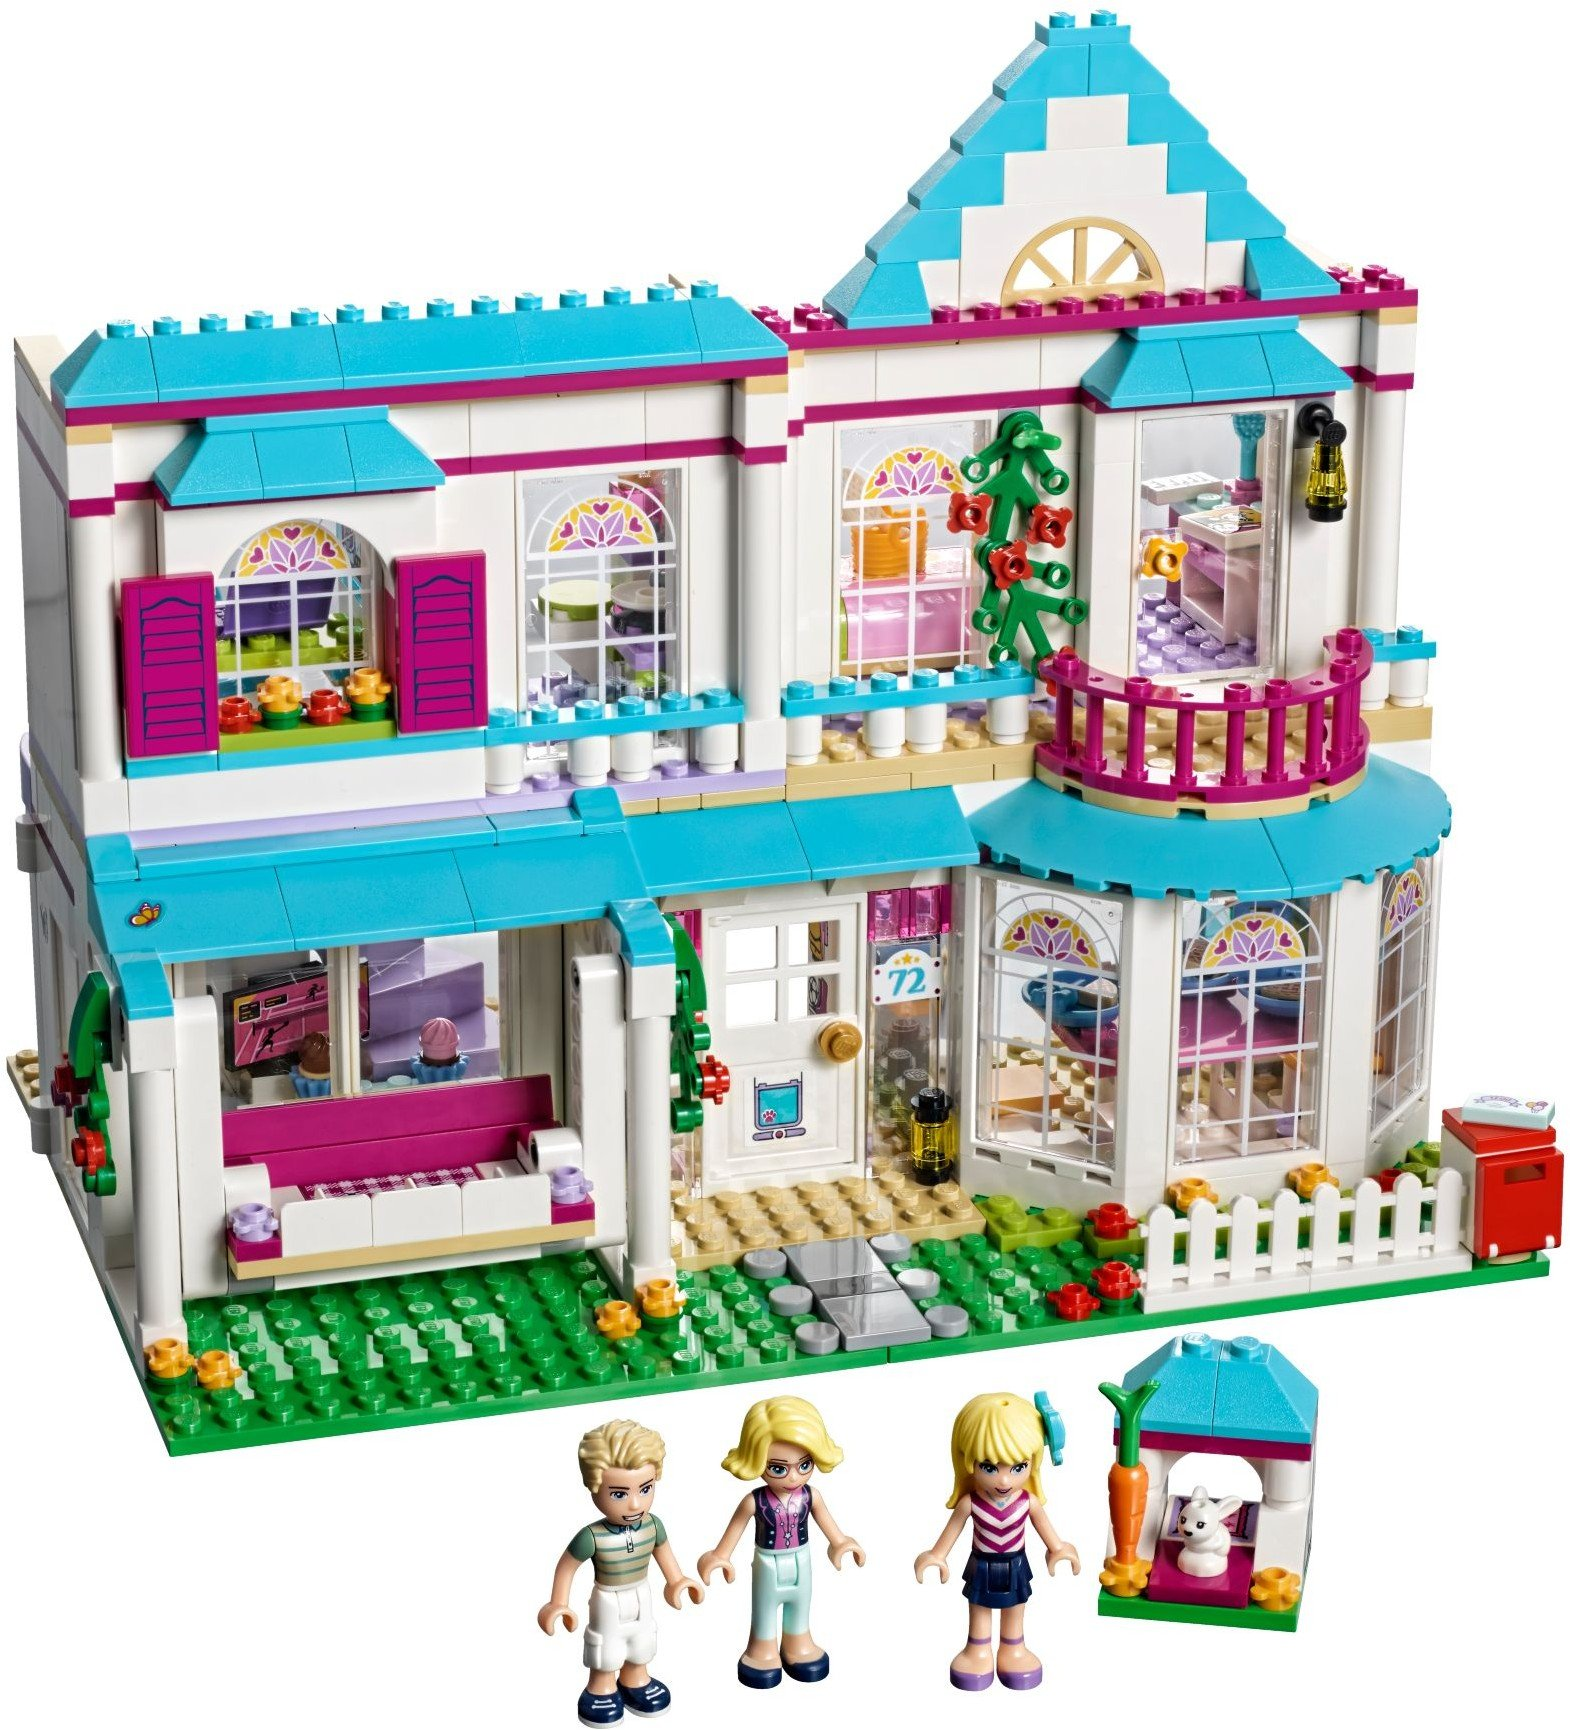 Buy LEGO Friends - Stephanie's House (41314)